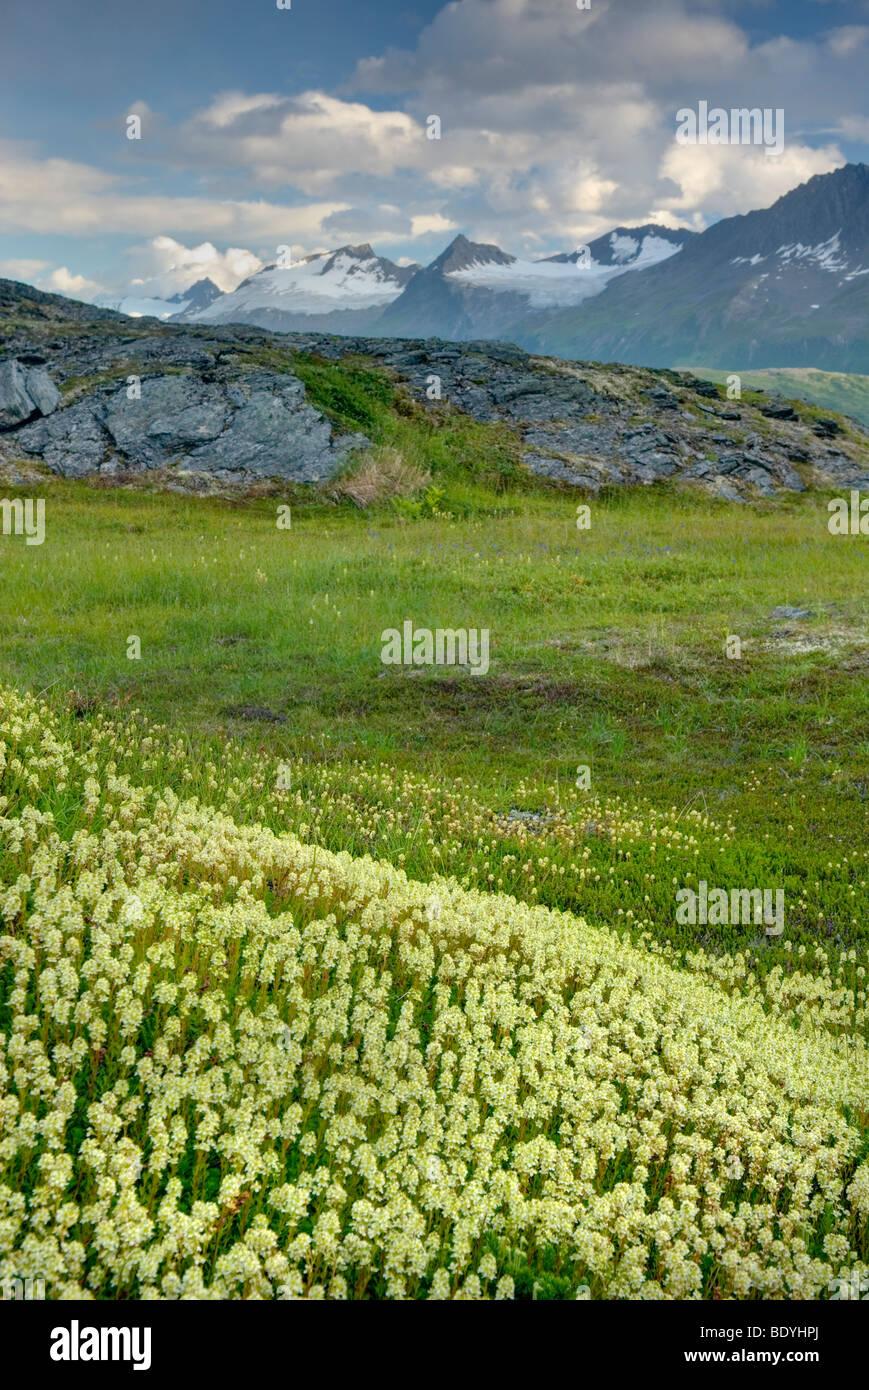 Alpine meadows carpeted with Partridge Foot (Luetkea pectinata) in the Chugach Mountains near Thompson Pass Alaska - Stock Image